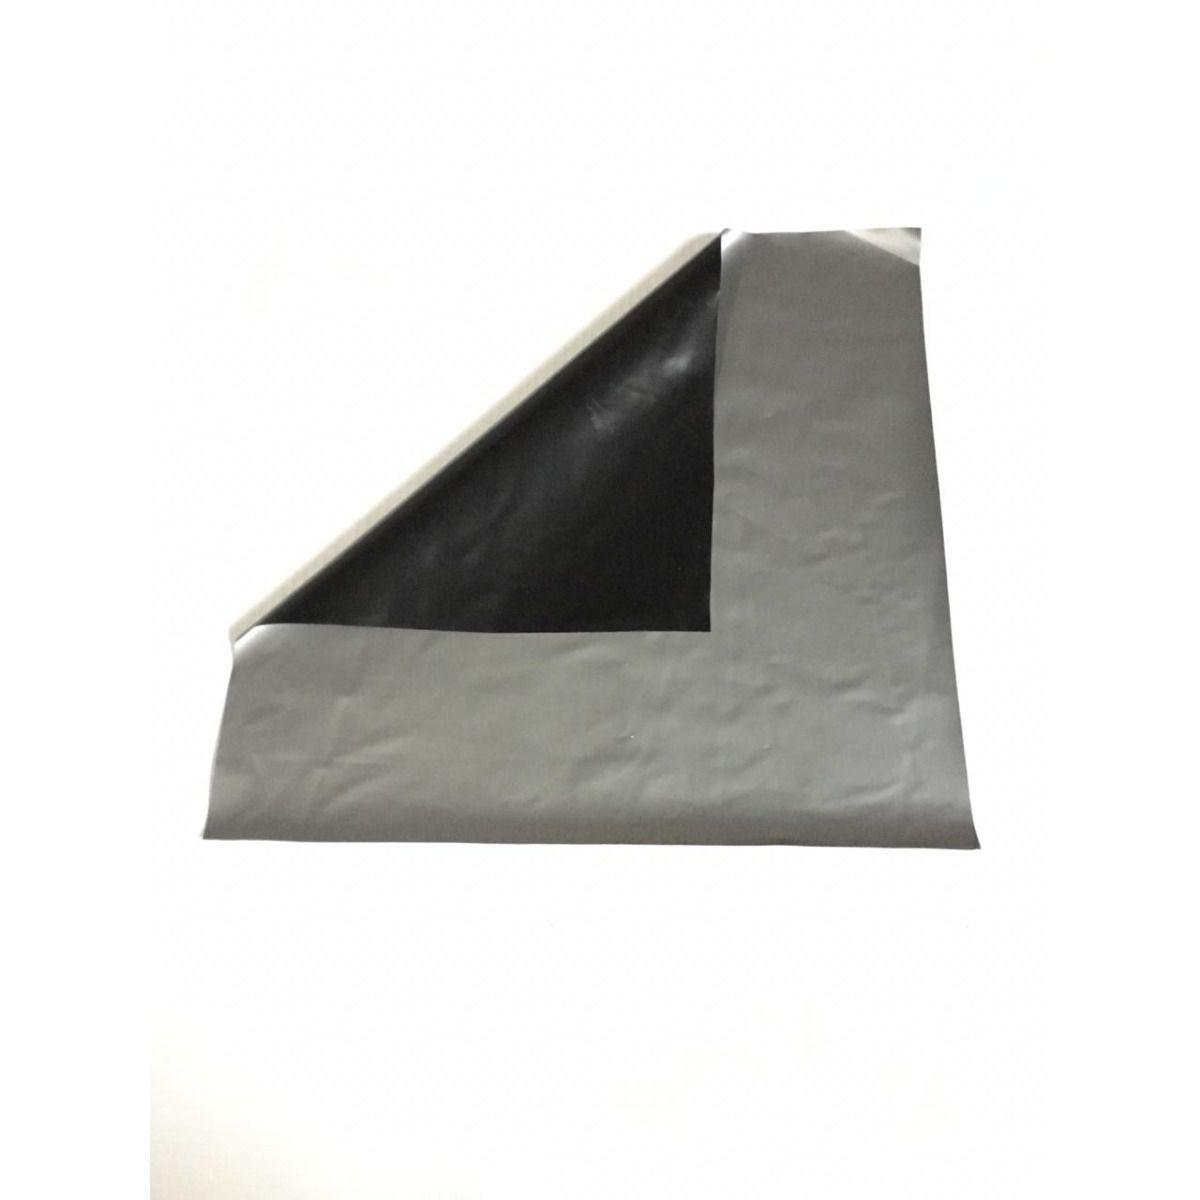 Lona Para Silagem Dupla Face Prata/Preta 35x12 Aprox 150 Mic